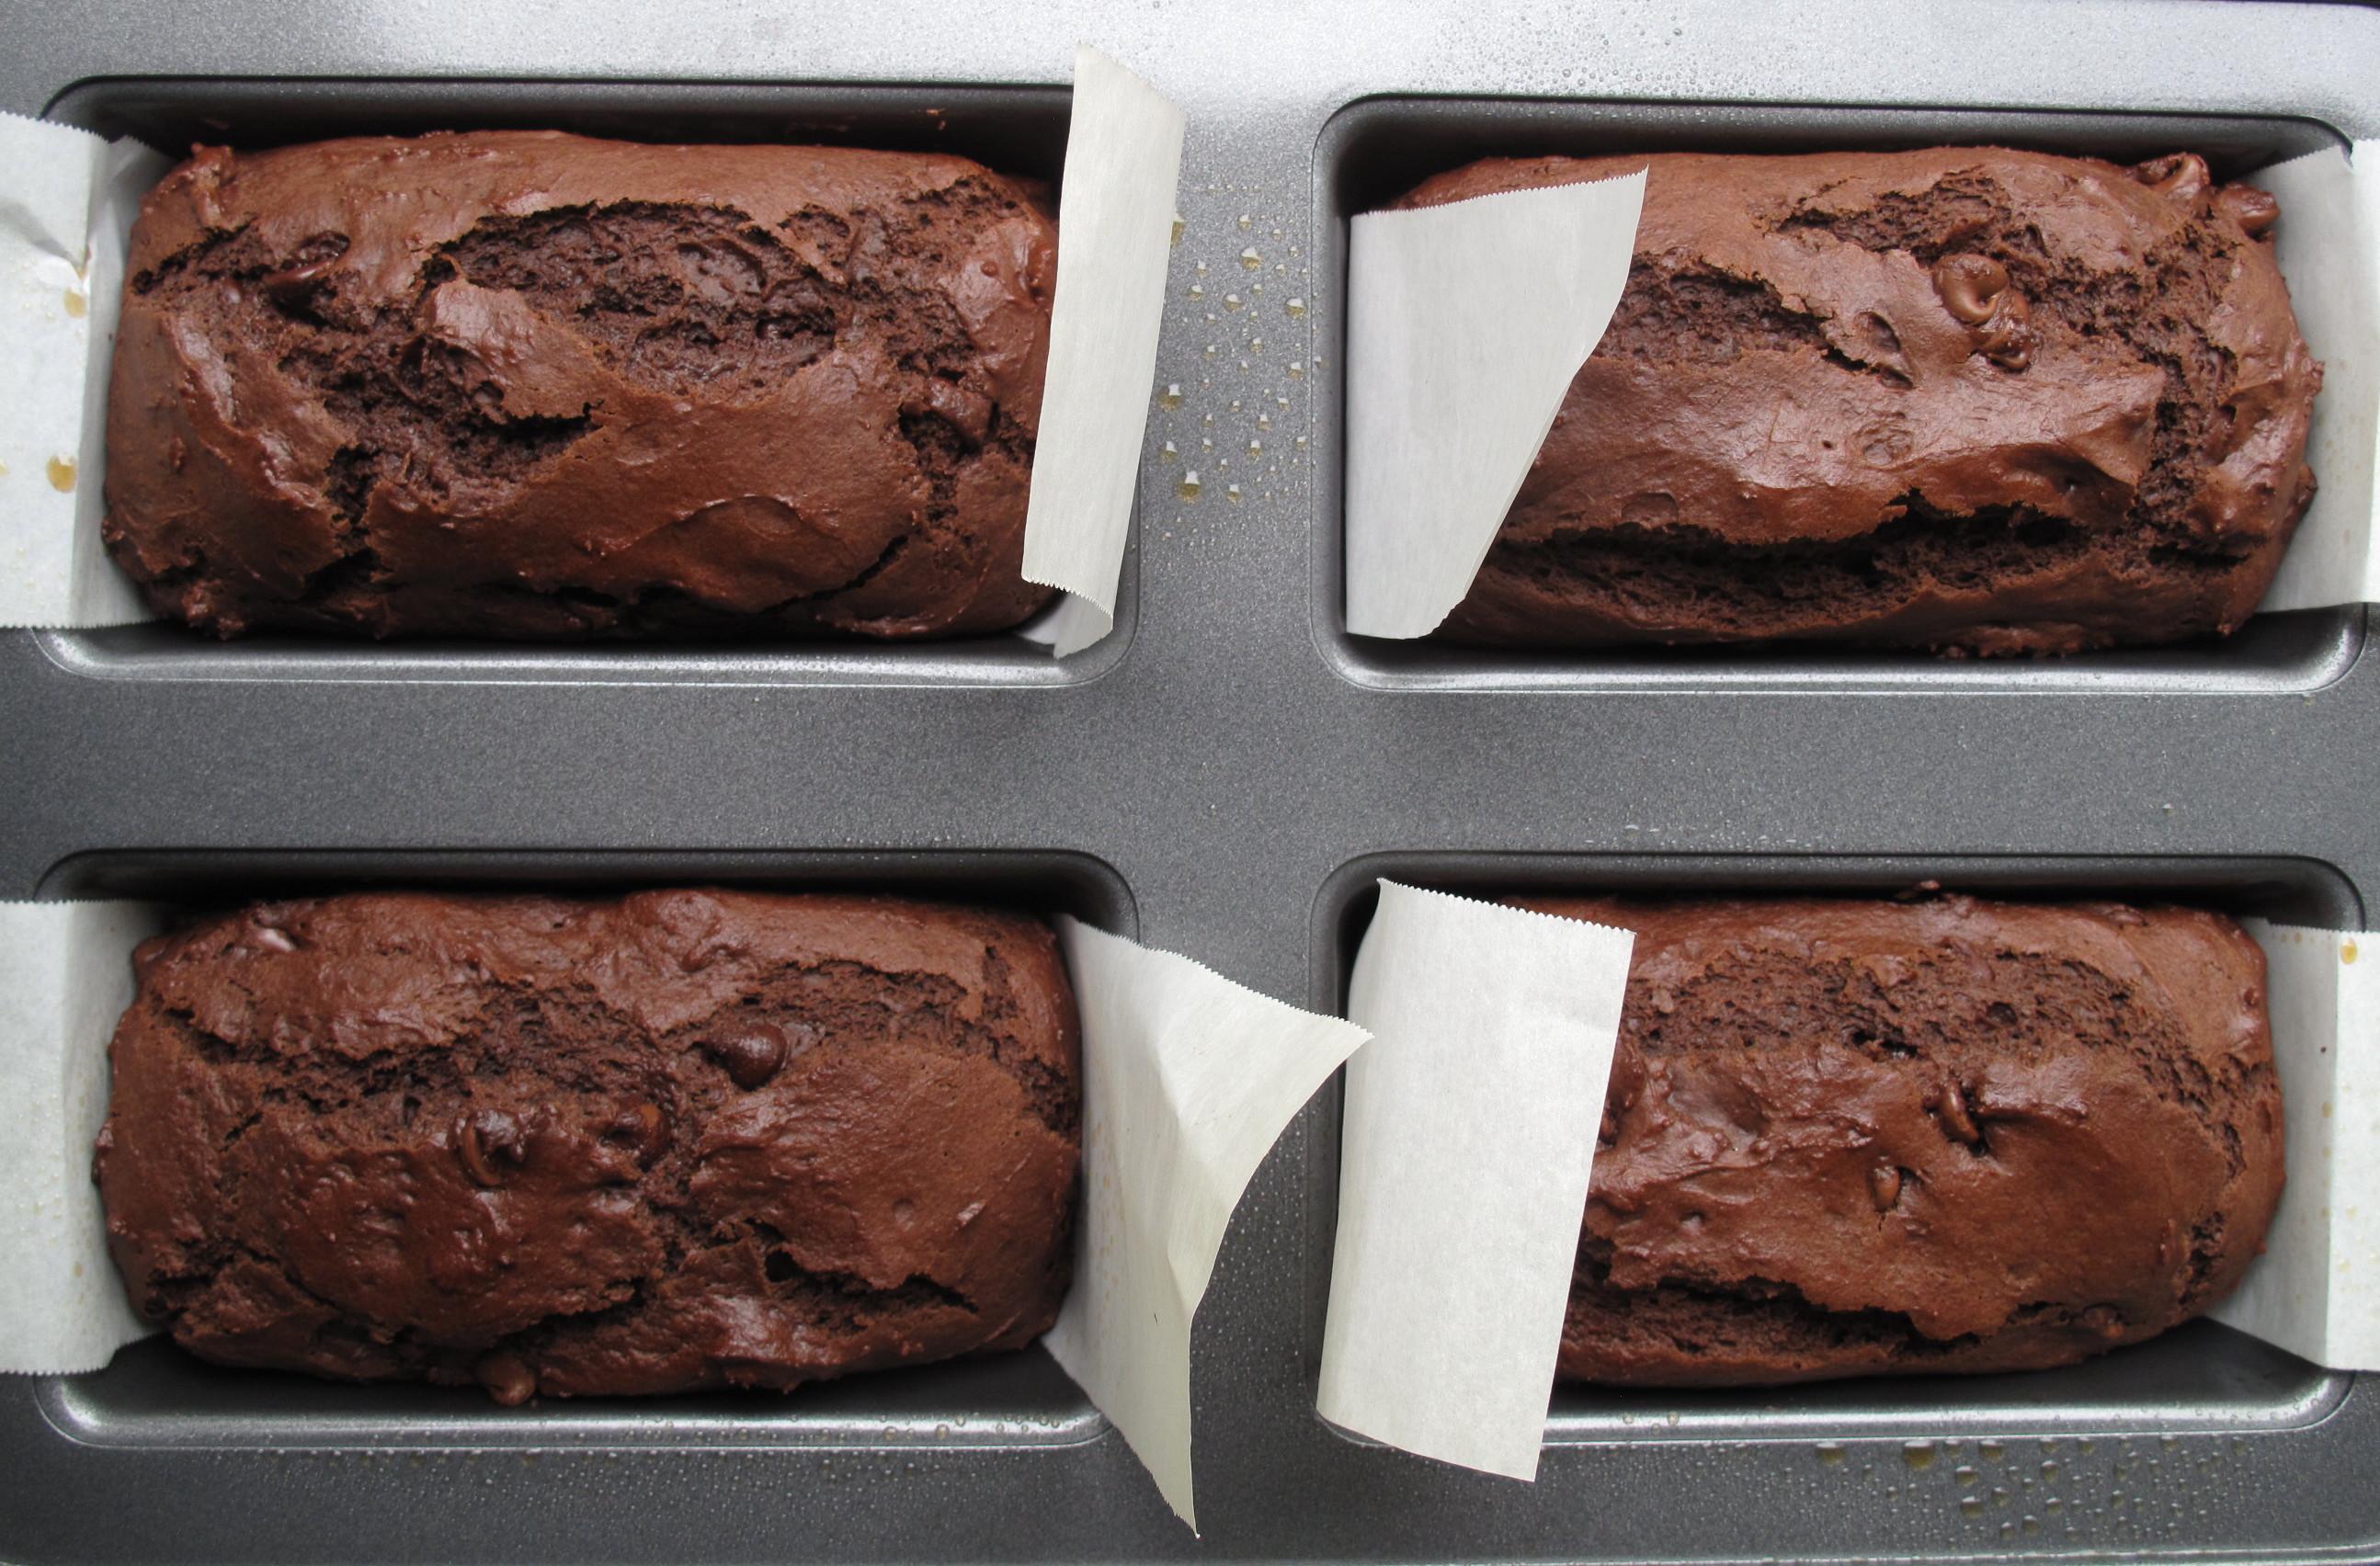 Loaf Recipes Using Cake Mix: Chocolate Yogurt Loaf Cake